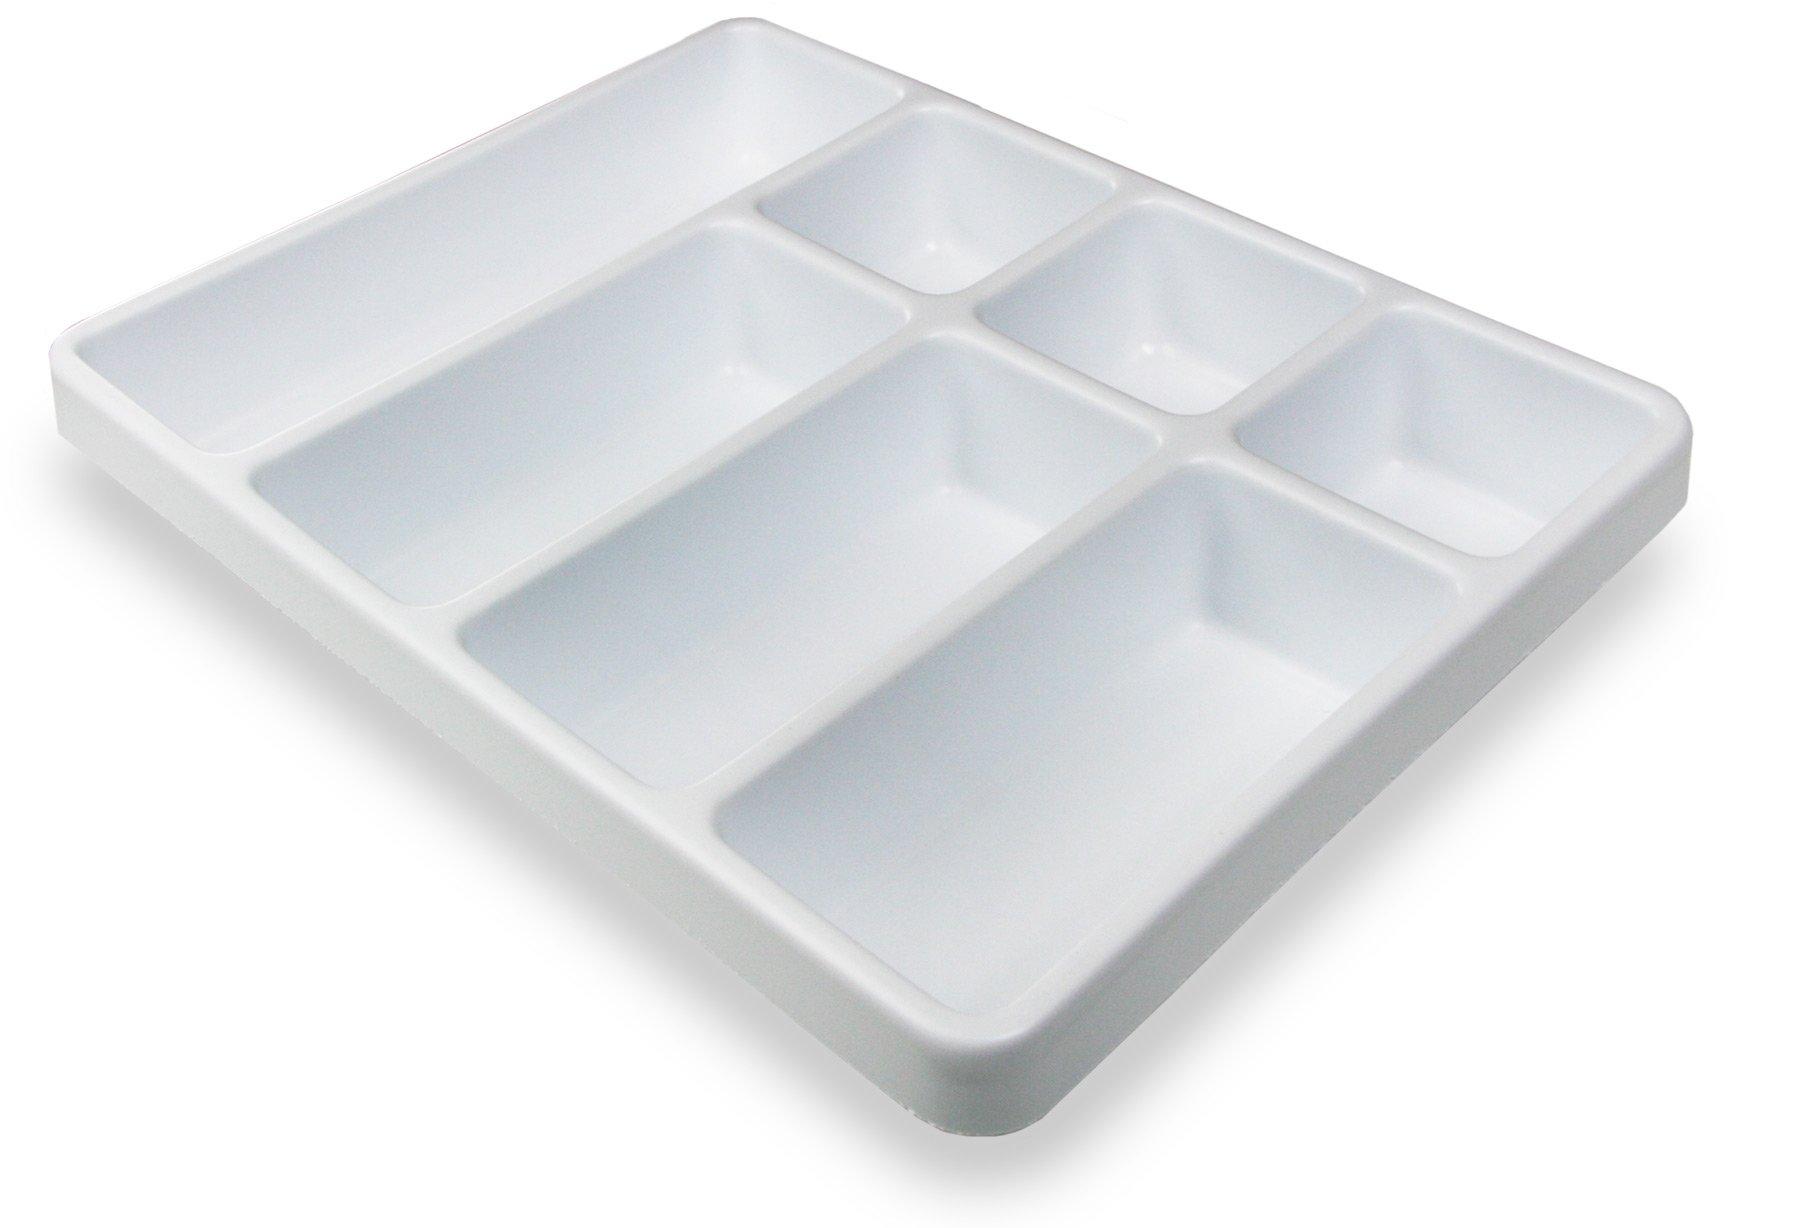 TrippNT 50056 White Polystyrene Plastic Big Drawer Organizer, 7 Compartments, 16.75'' Width x 2.38'' Height x 12.9'' Depth